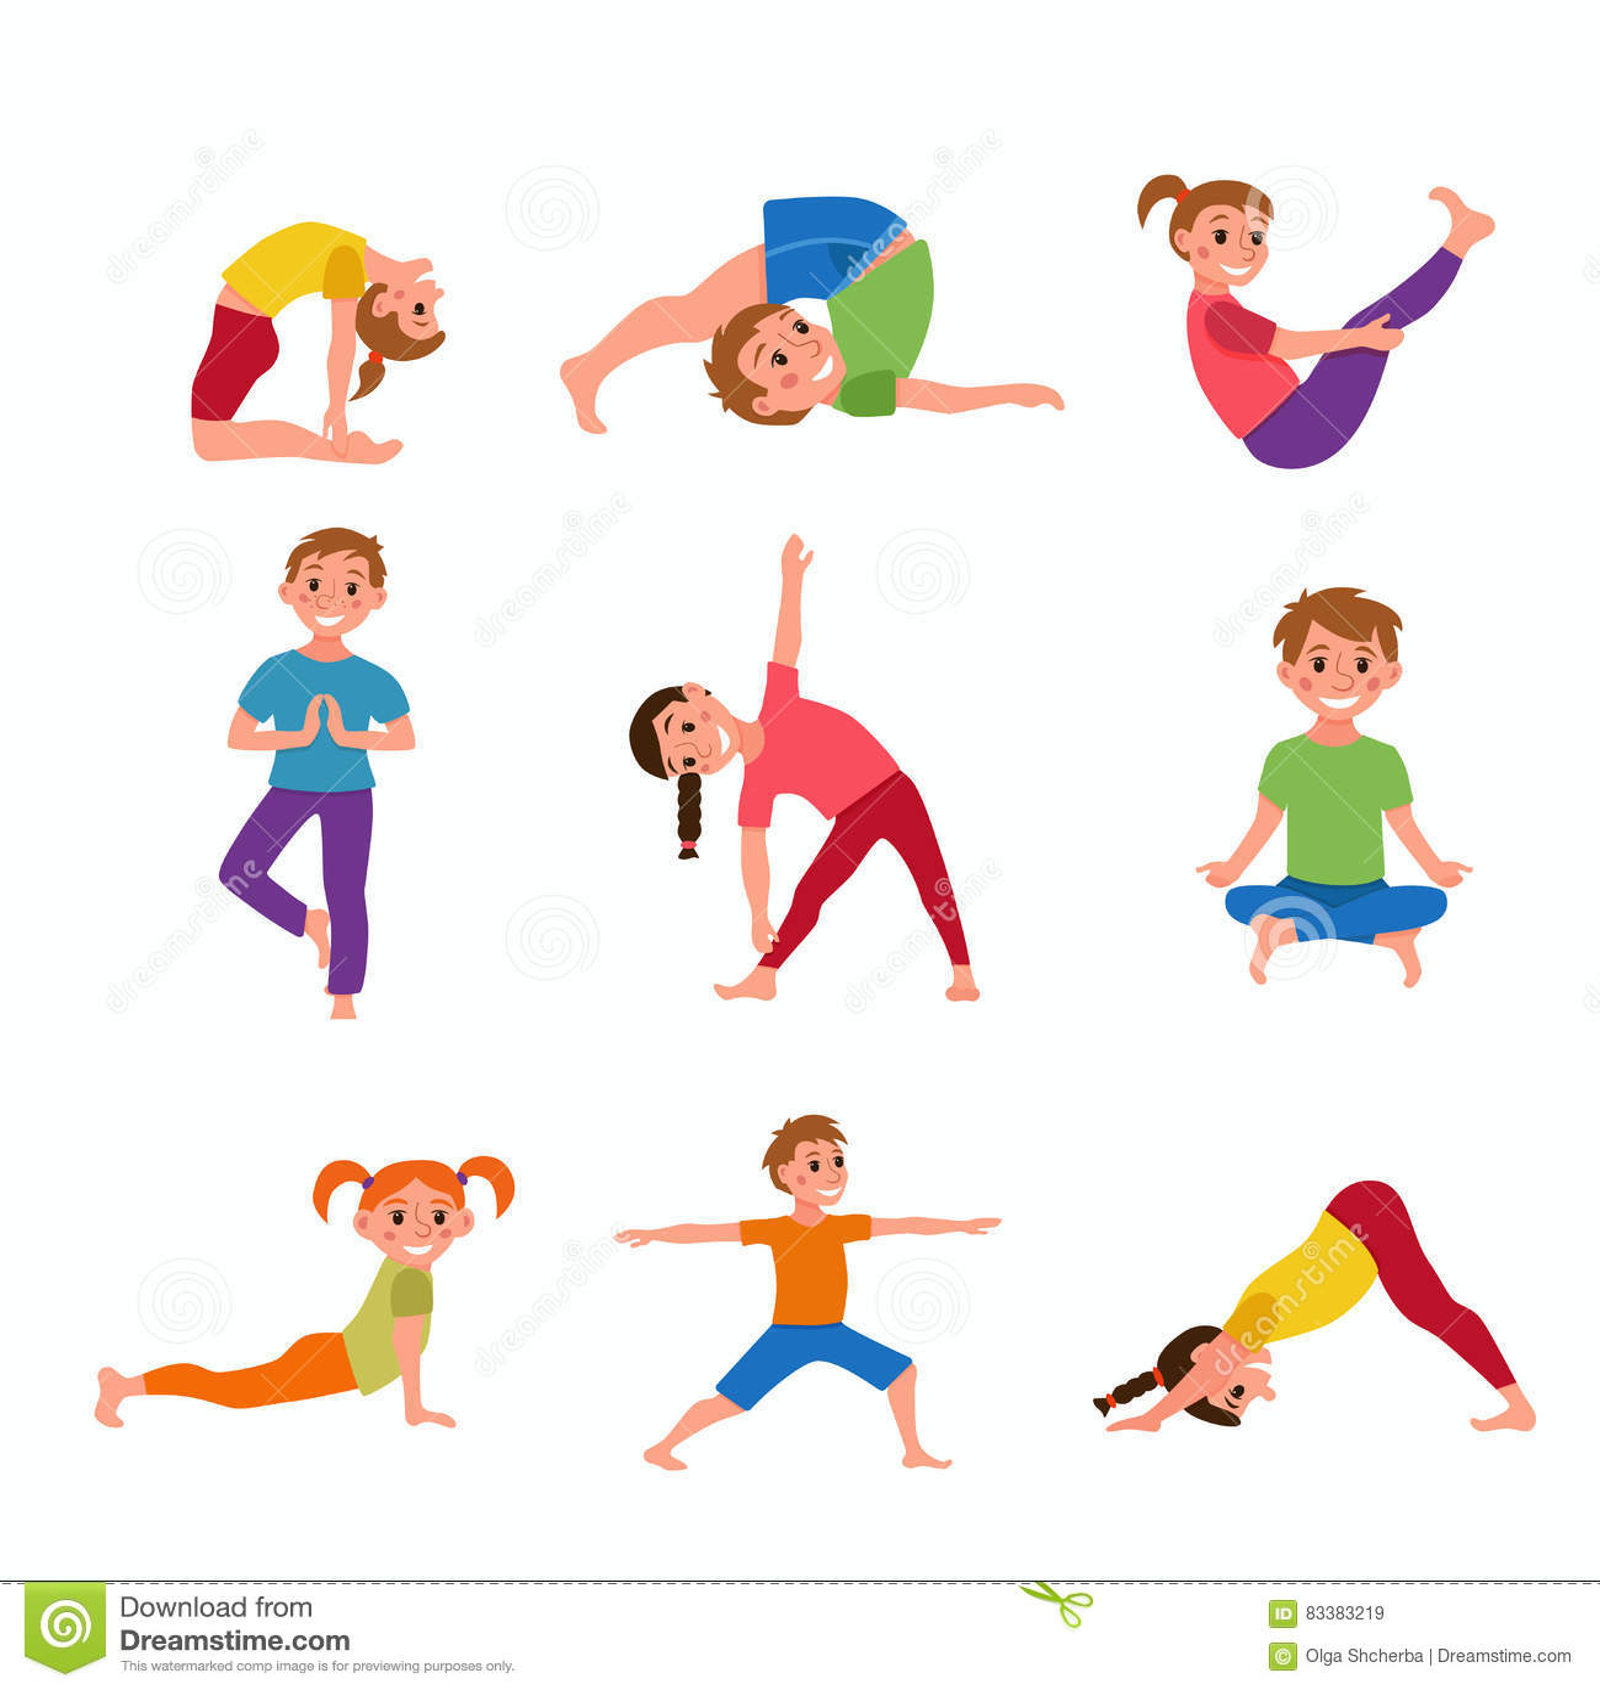 Yoga Kids Poses Stock Vector Illustration Of Balance 83383219